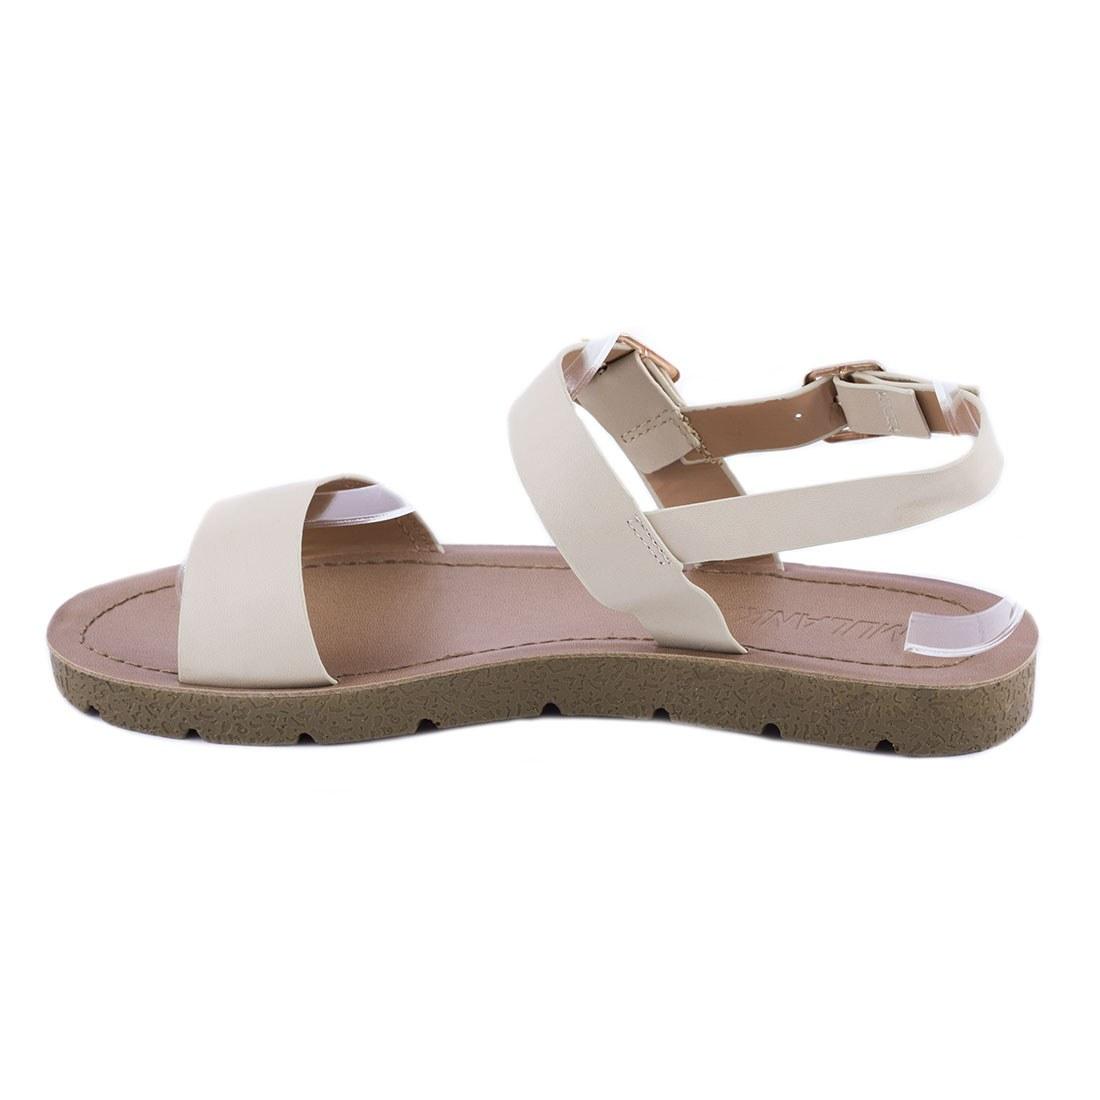 Sandale dama cu talpa joasa K-58-ROZ la 29,99Lei - Zibra.ro